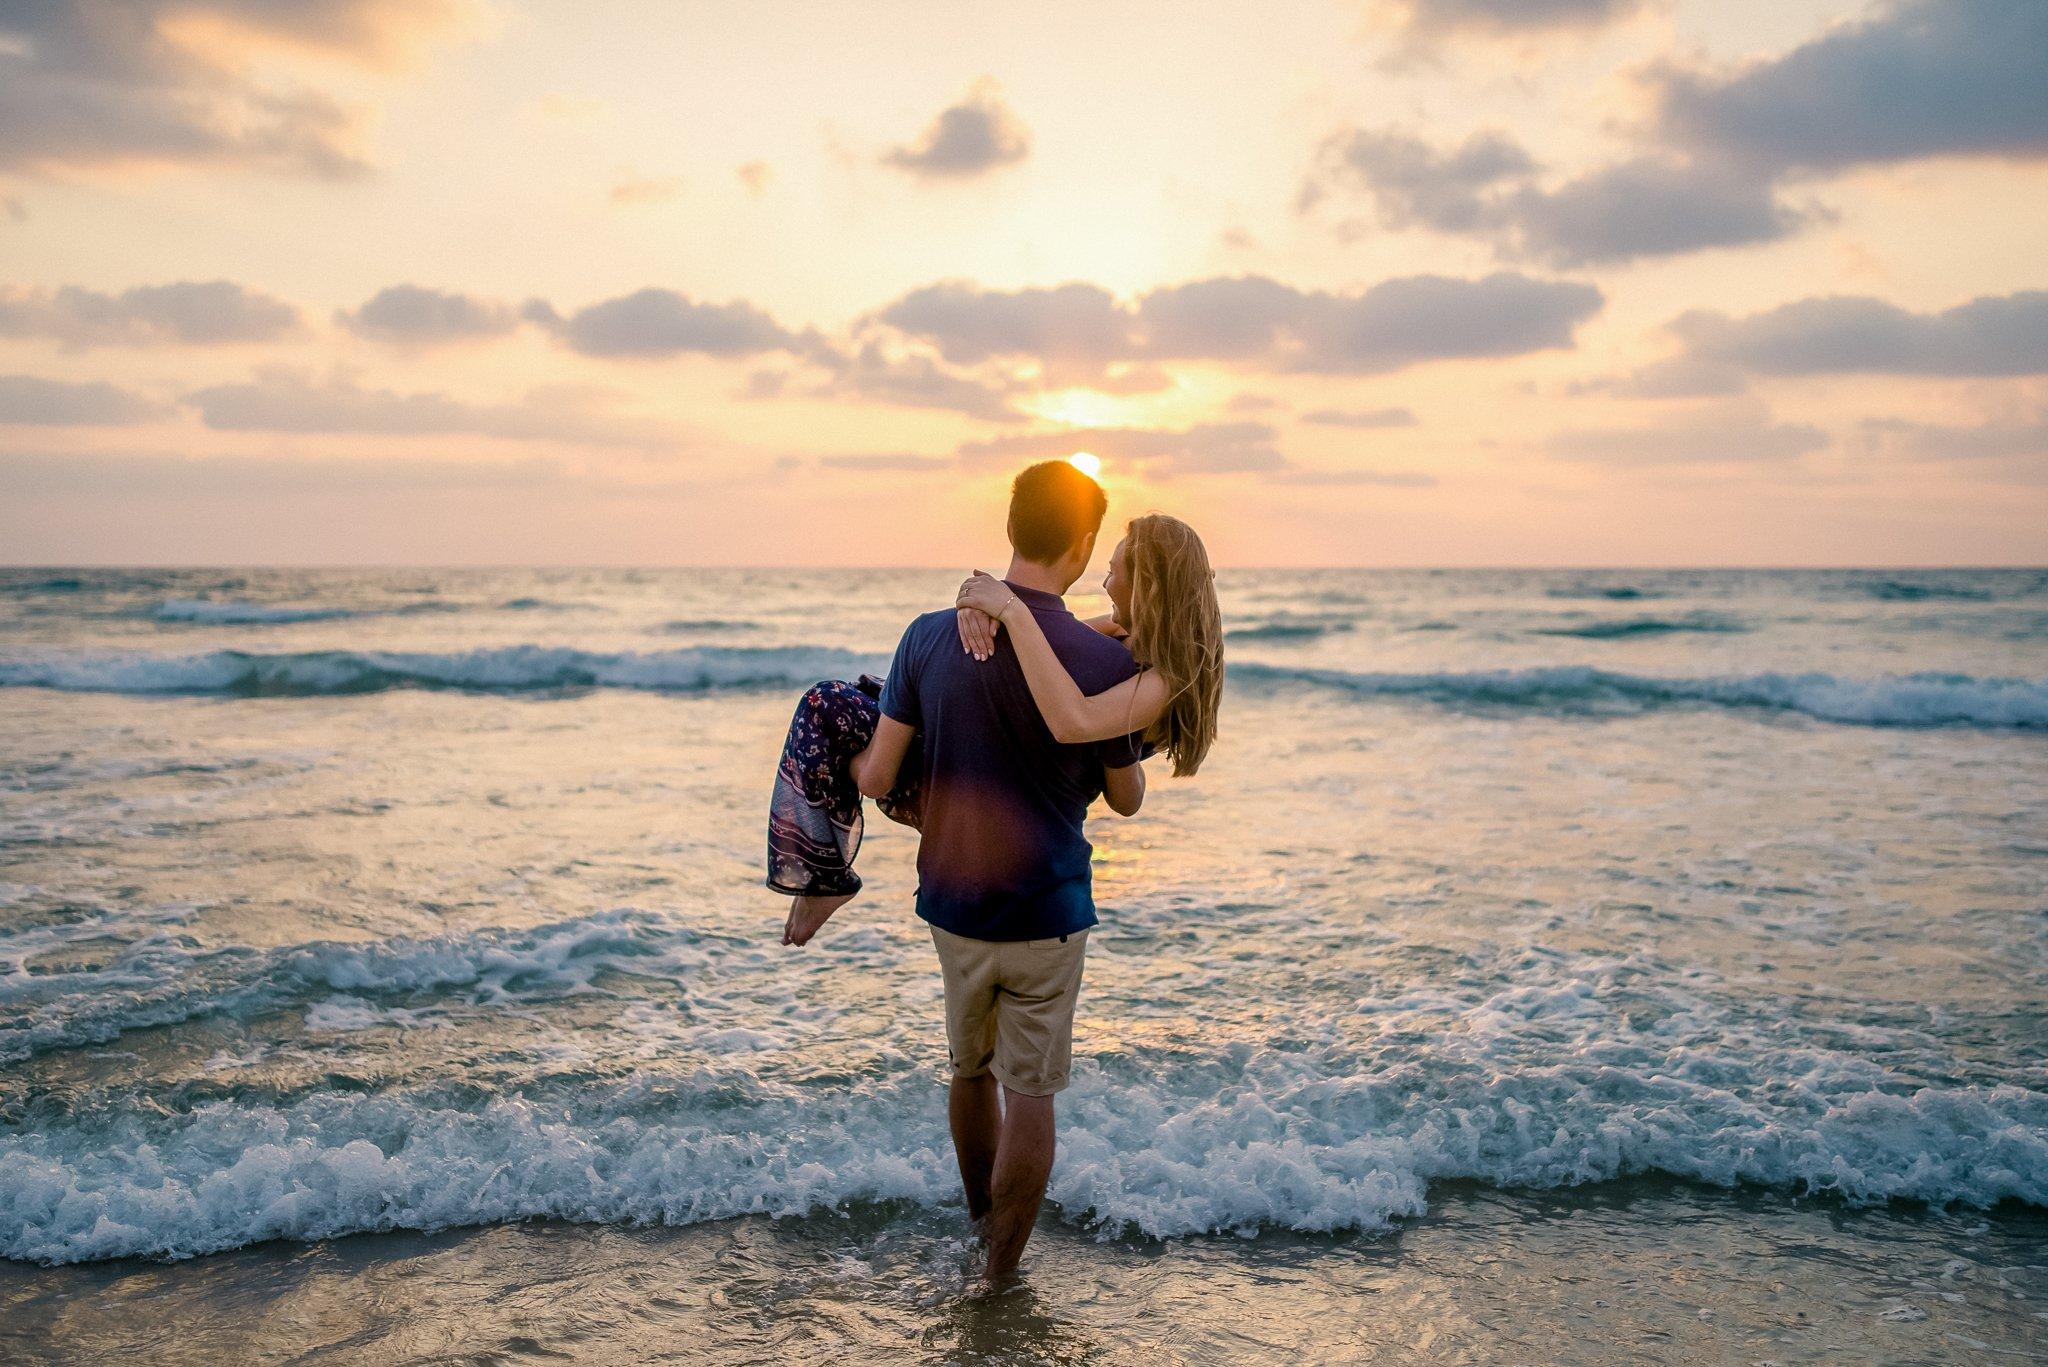 Netanya-israel-beach-engagement-session-kate-giryes-photography-3913_WEB.jpg